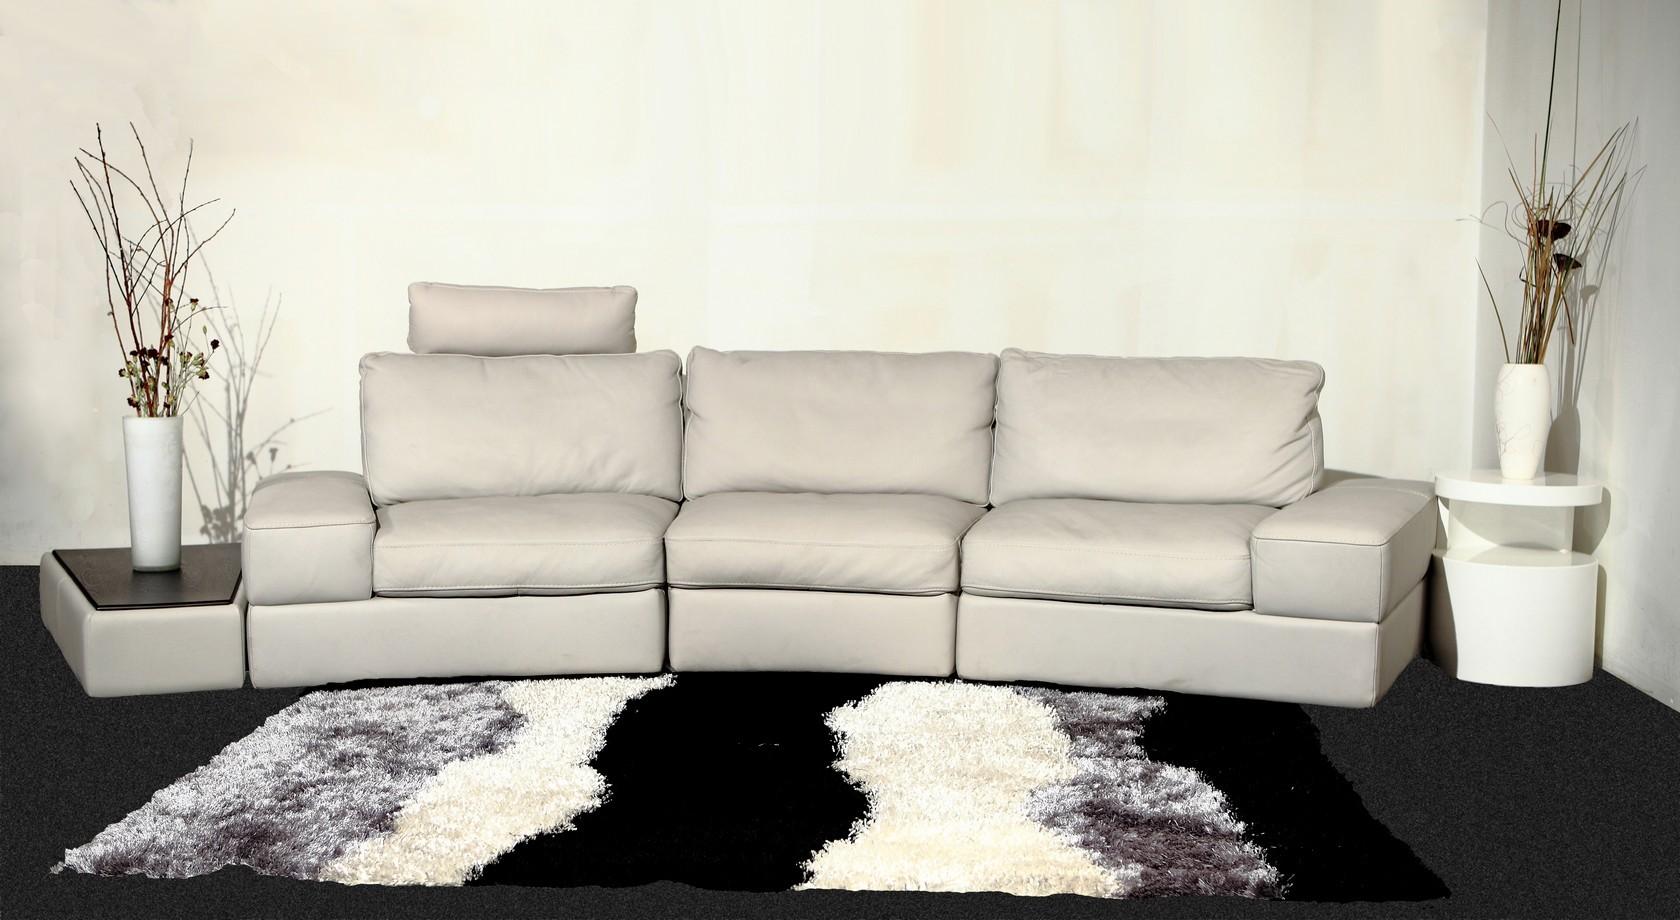 Modi Sofa By Beverly Hills Buy From Nova Interiors